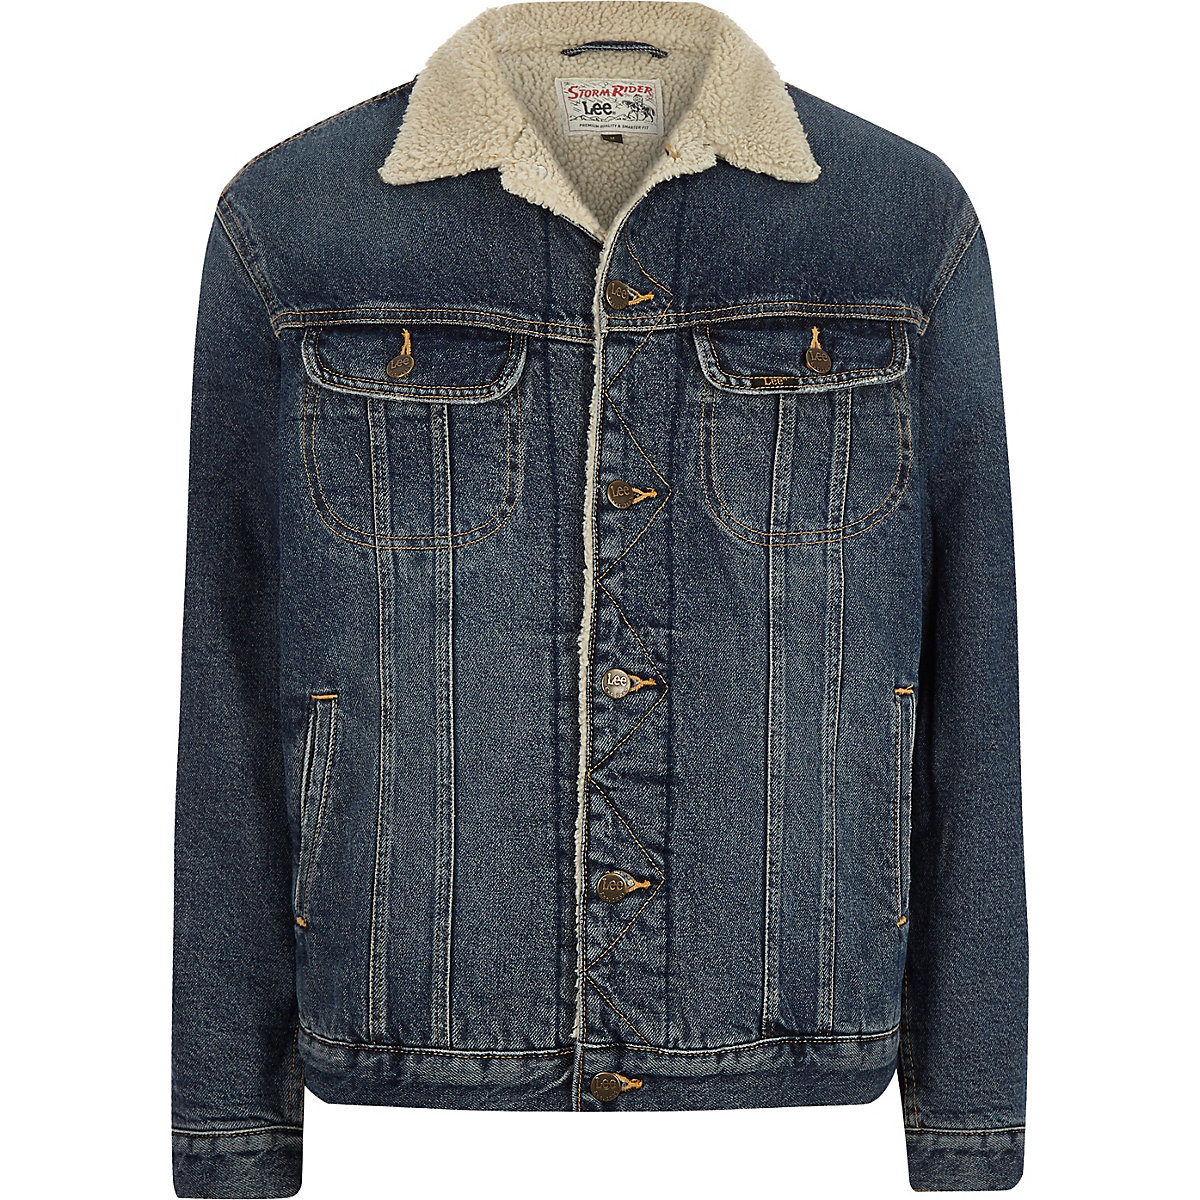 Lee blue fleece collar denim jacket